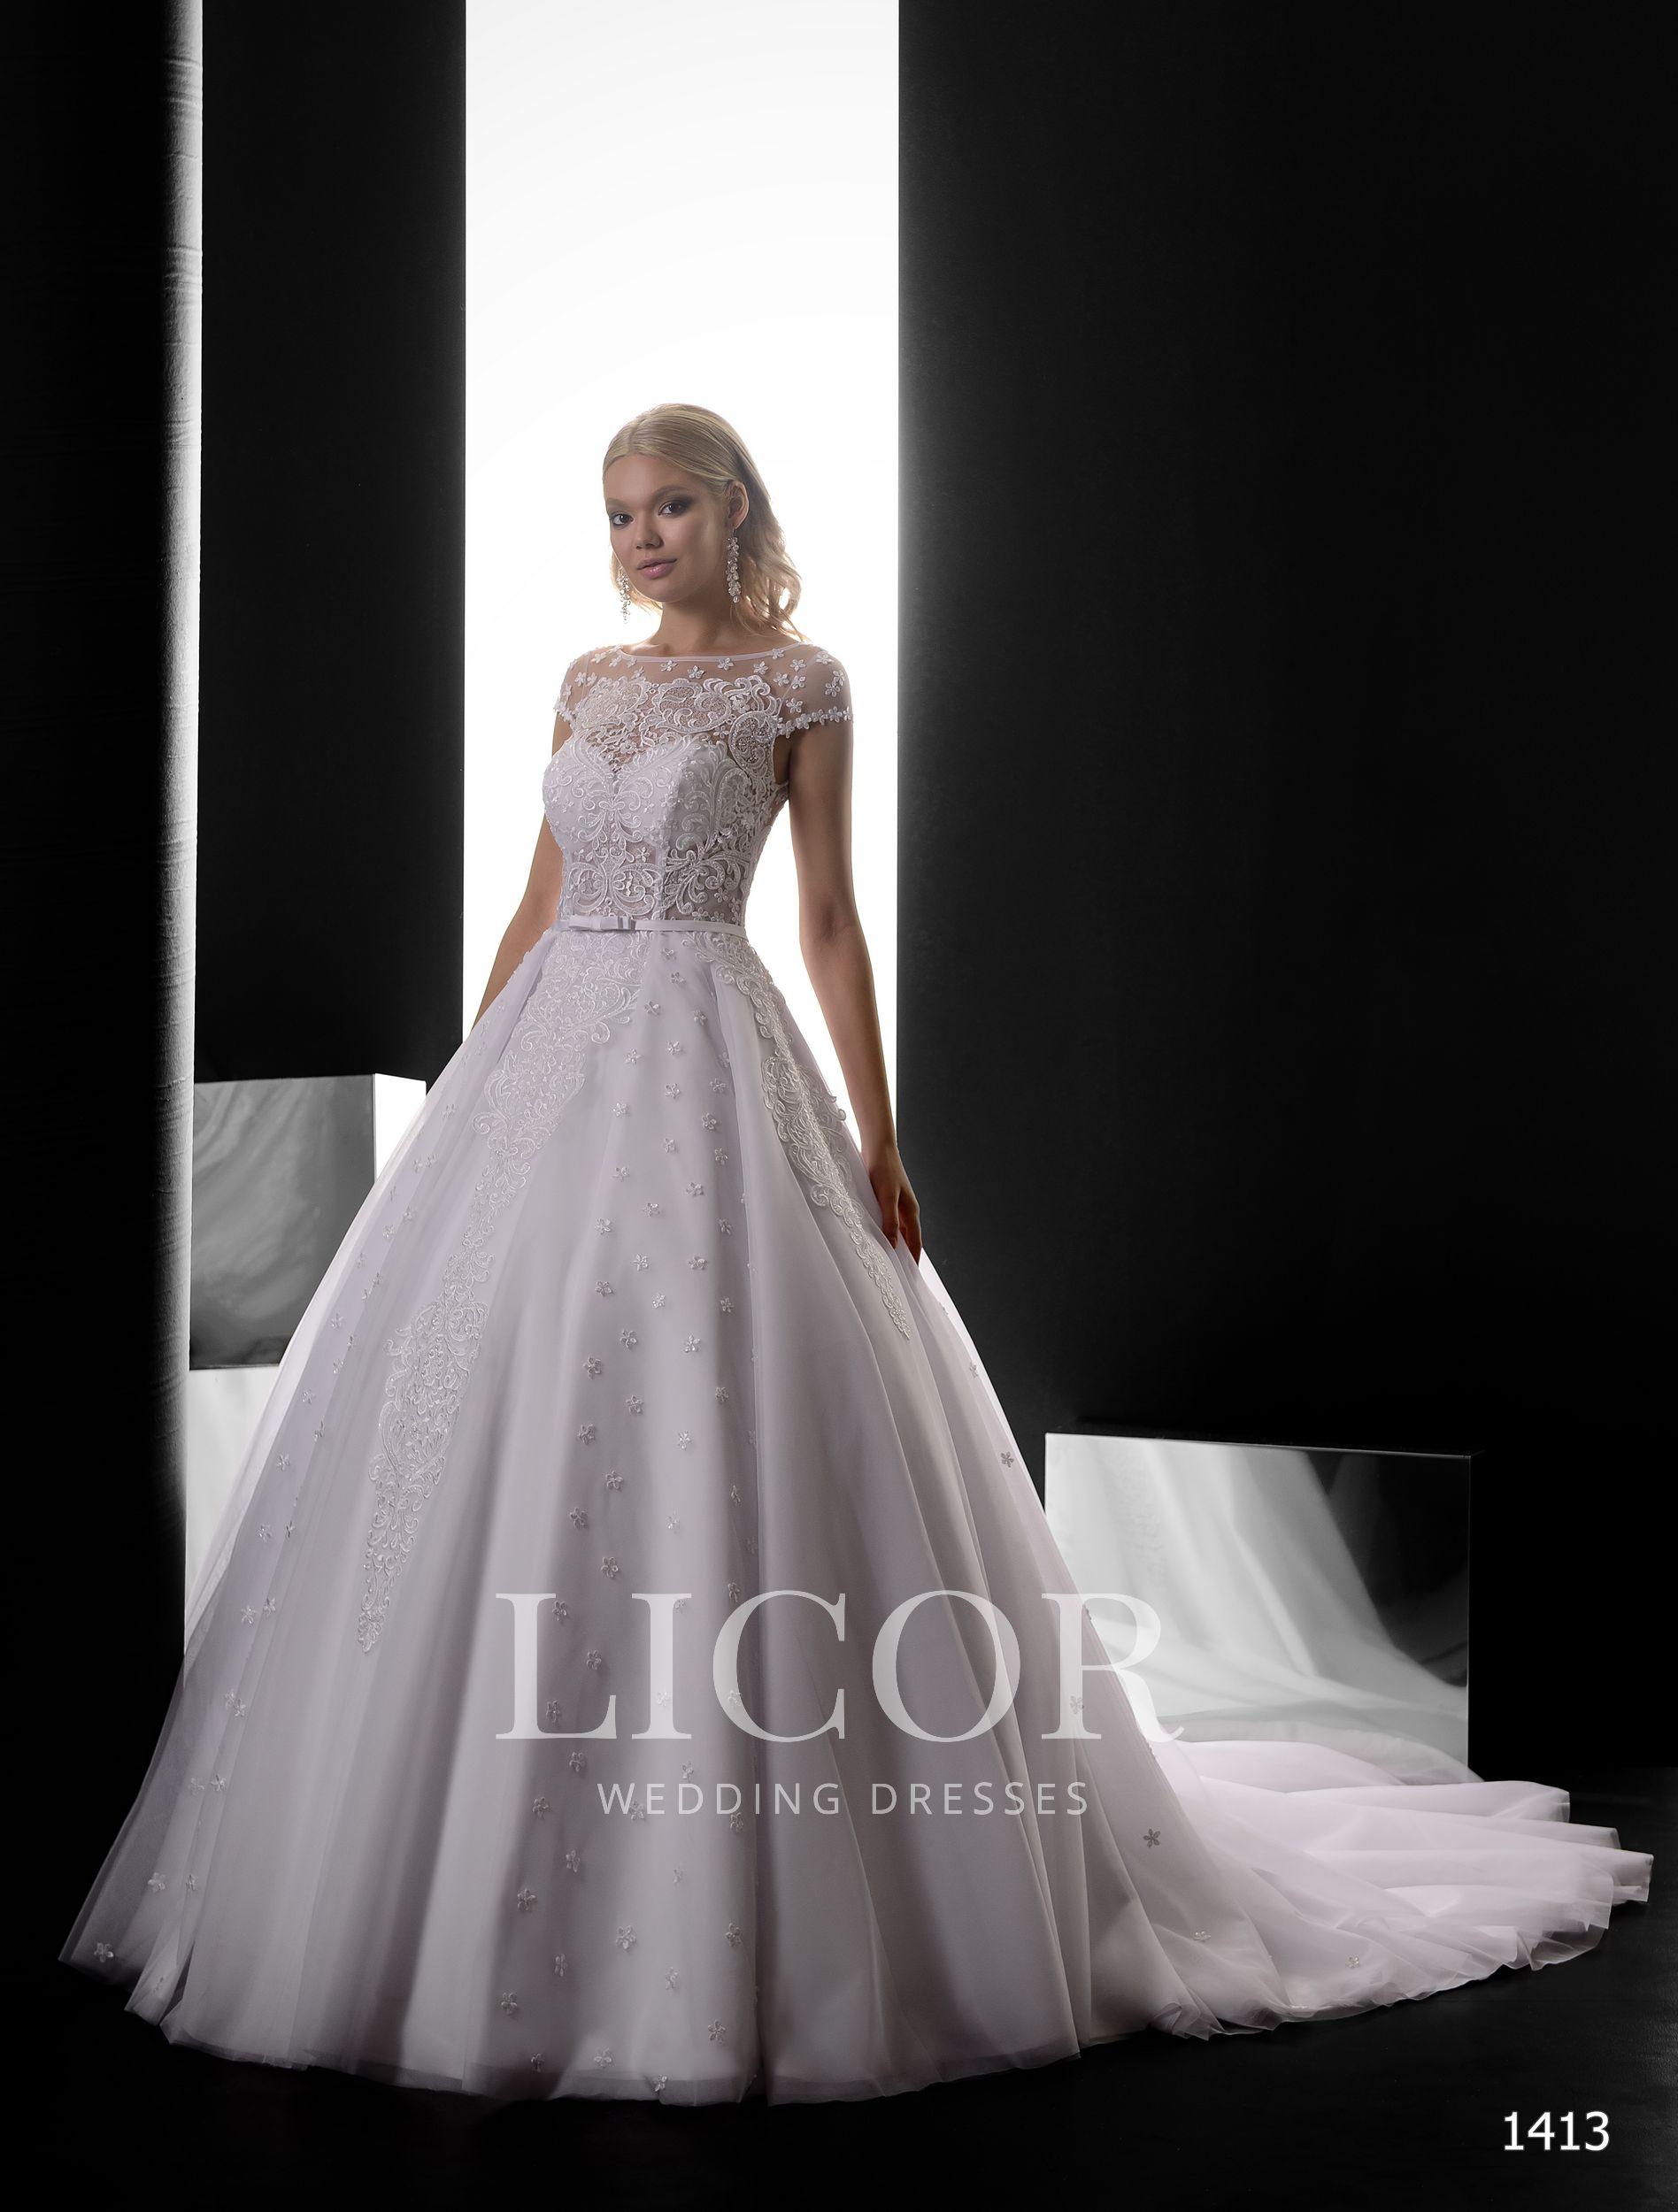 https://licor.com.ua/images/stories/virtuemart/product/1413(1).jpg